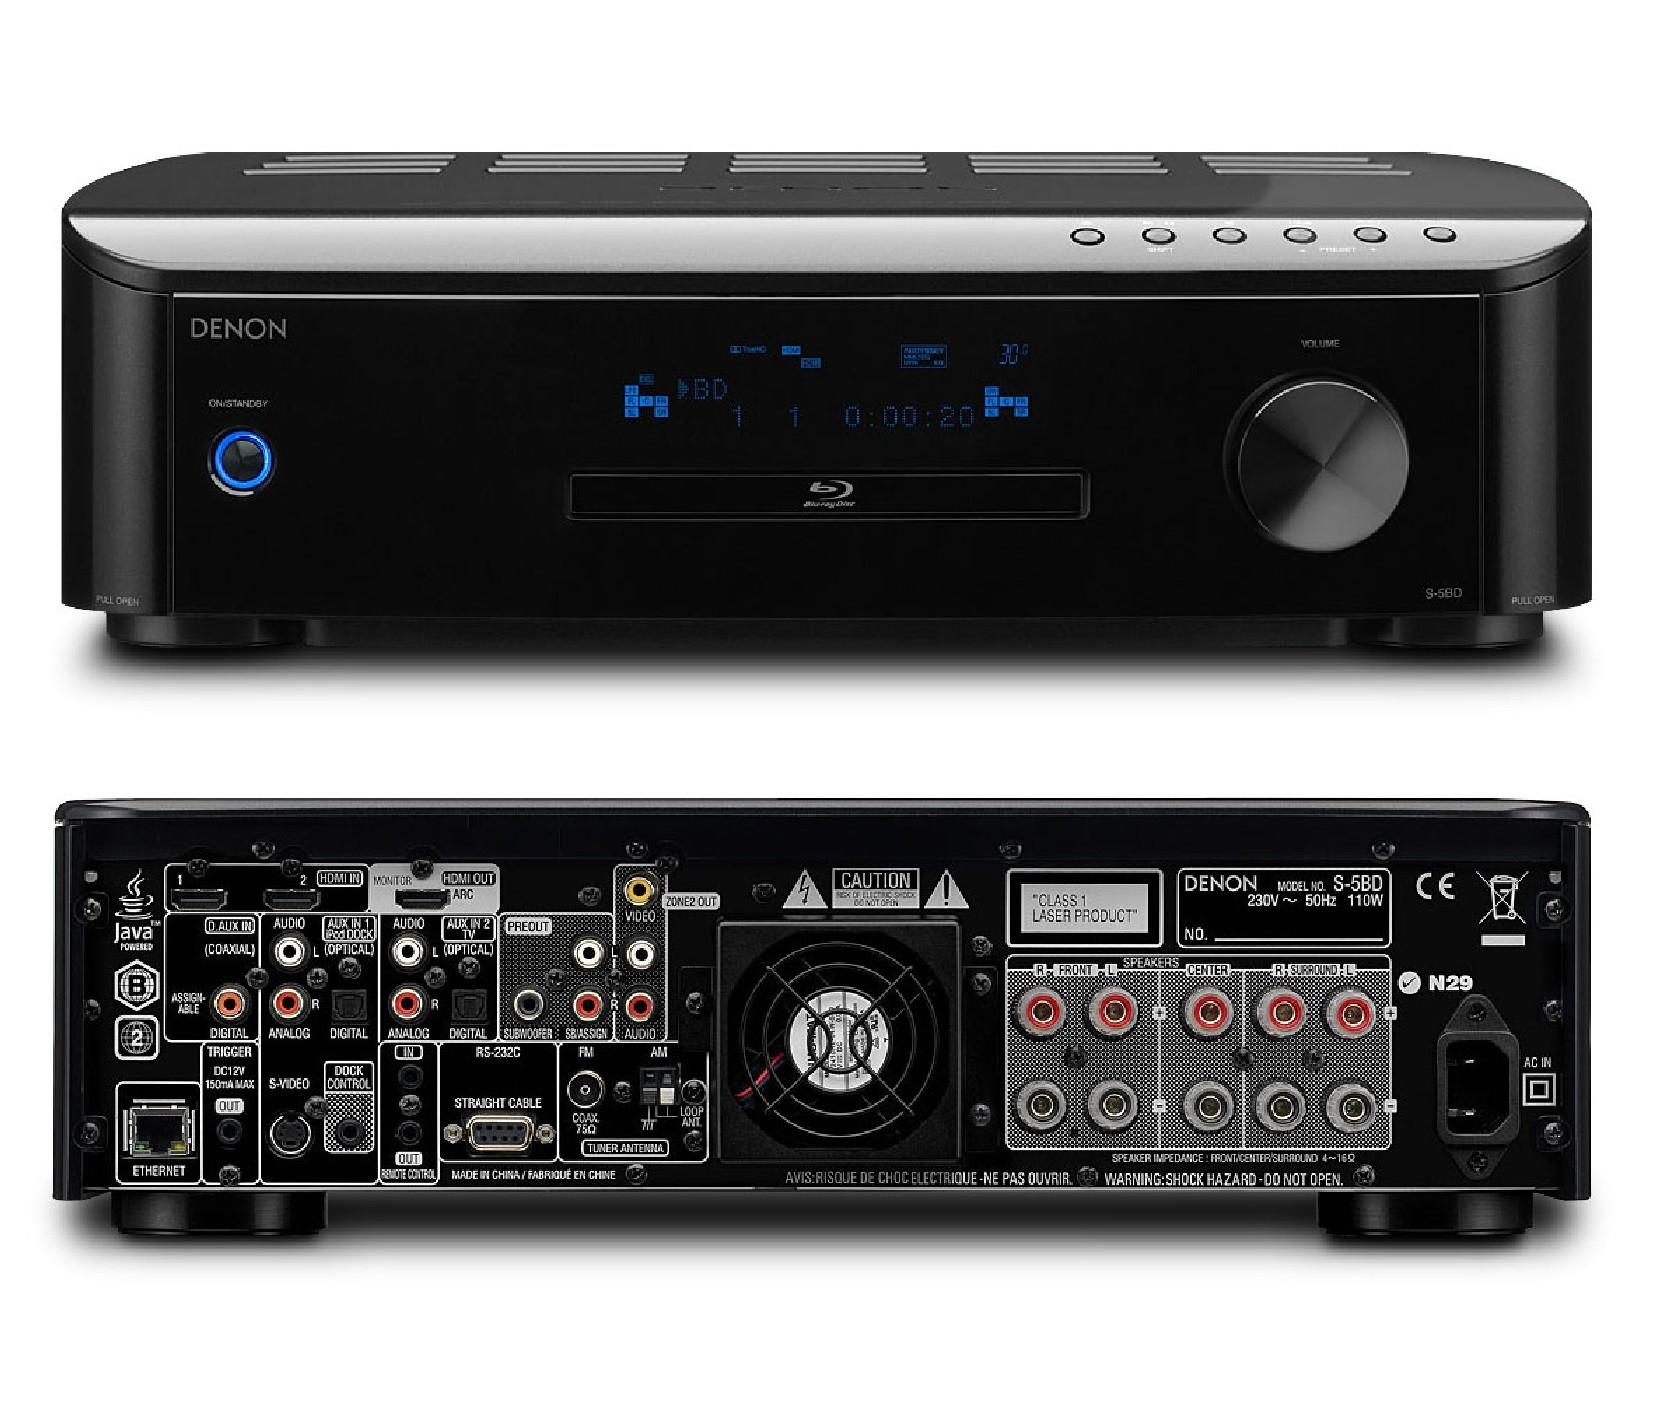 denon cara s 5bd 5 1 home cinema aio blu ray player receiver amplifier 3hdmi usb ebay. Black Bedroom Furniture Sets. Home Design Ideas